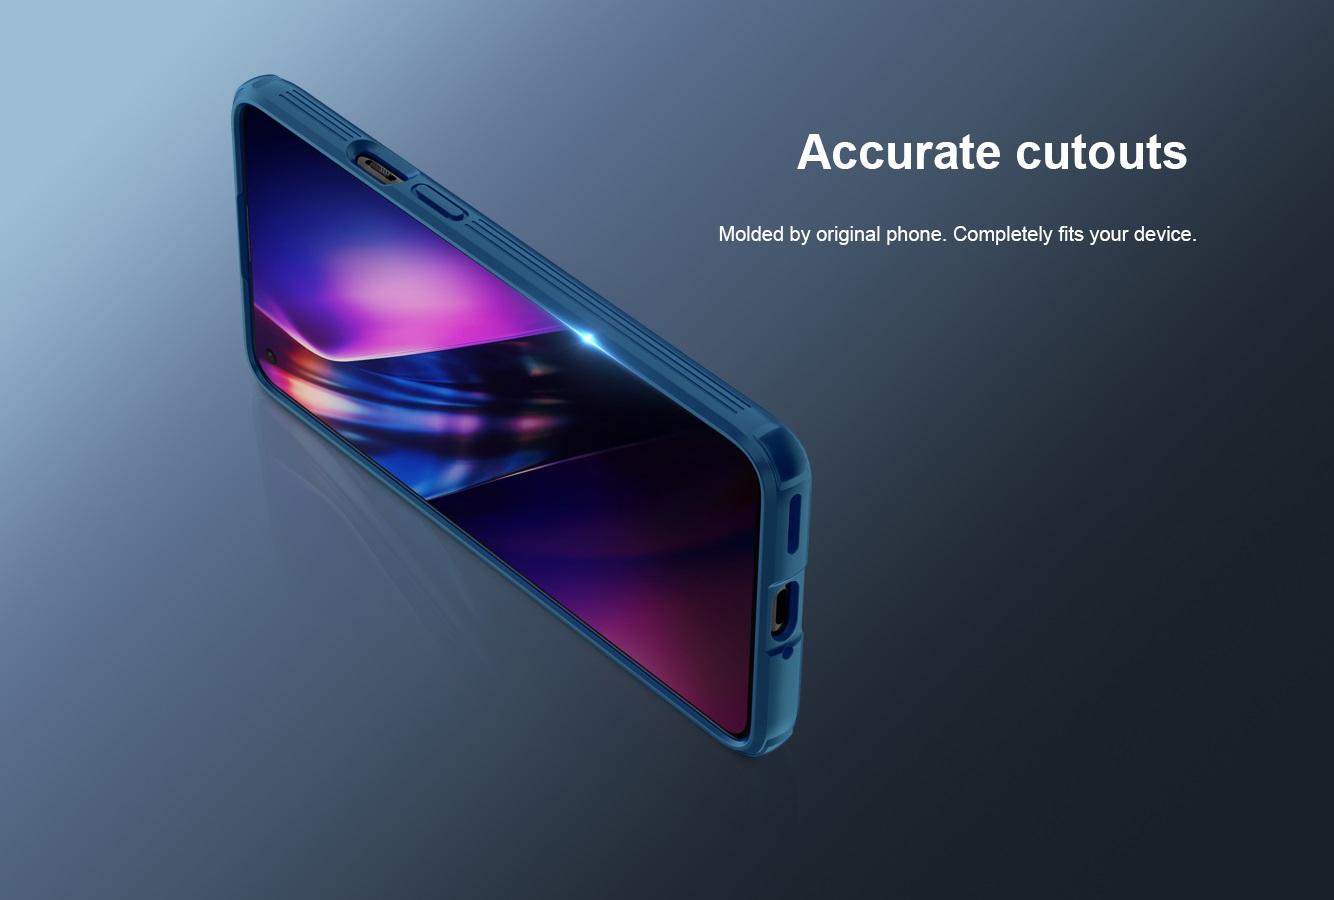 OnePlus_9_CamShield_Pro_Case-05.jpg